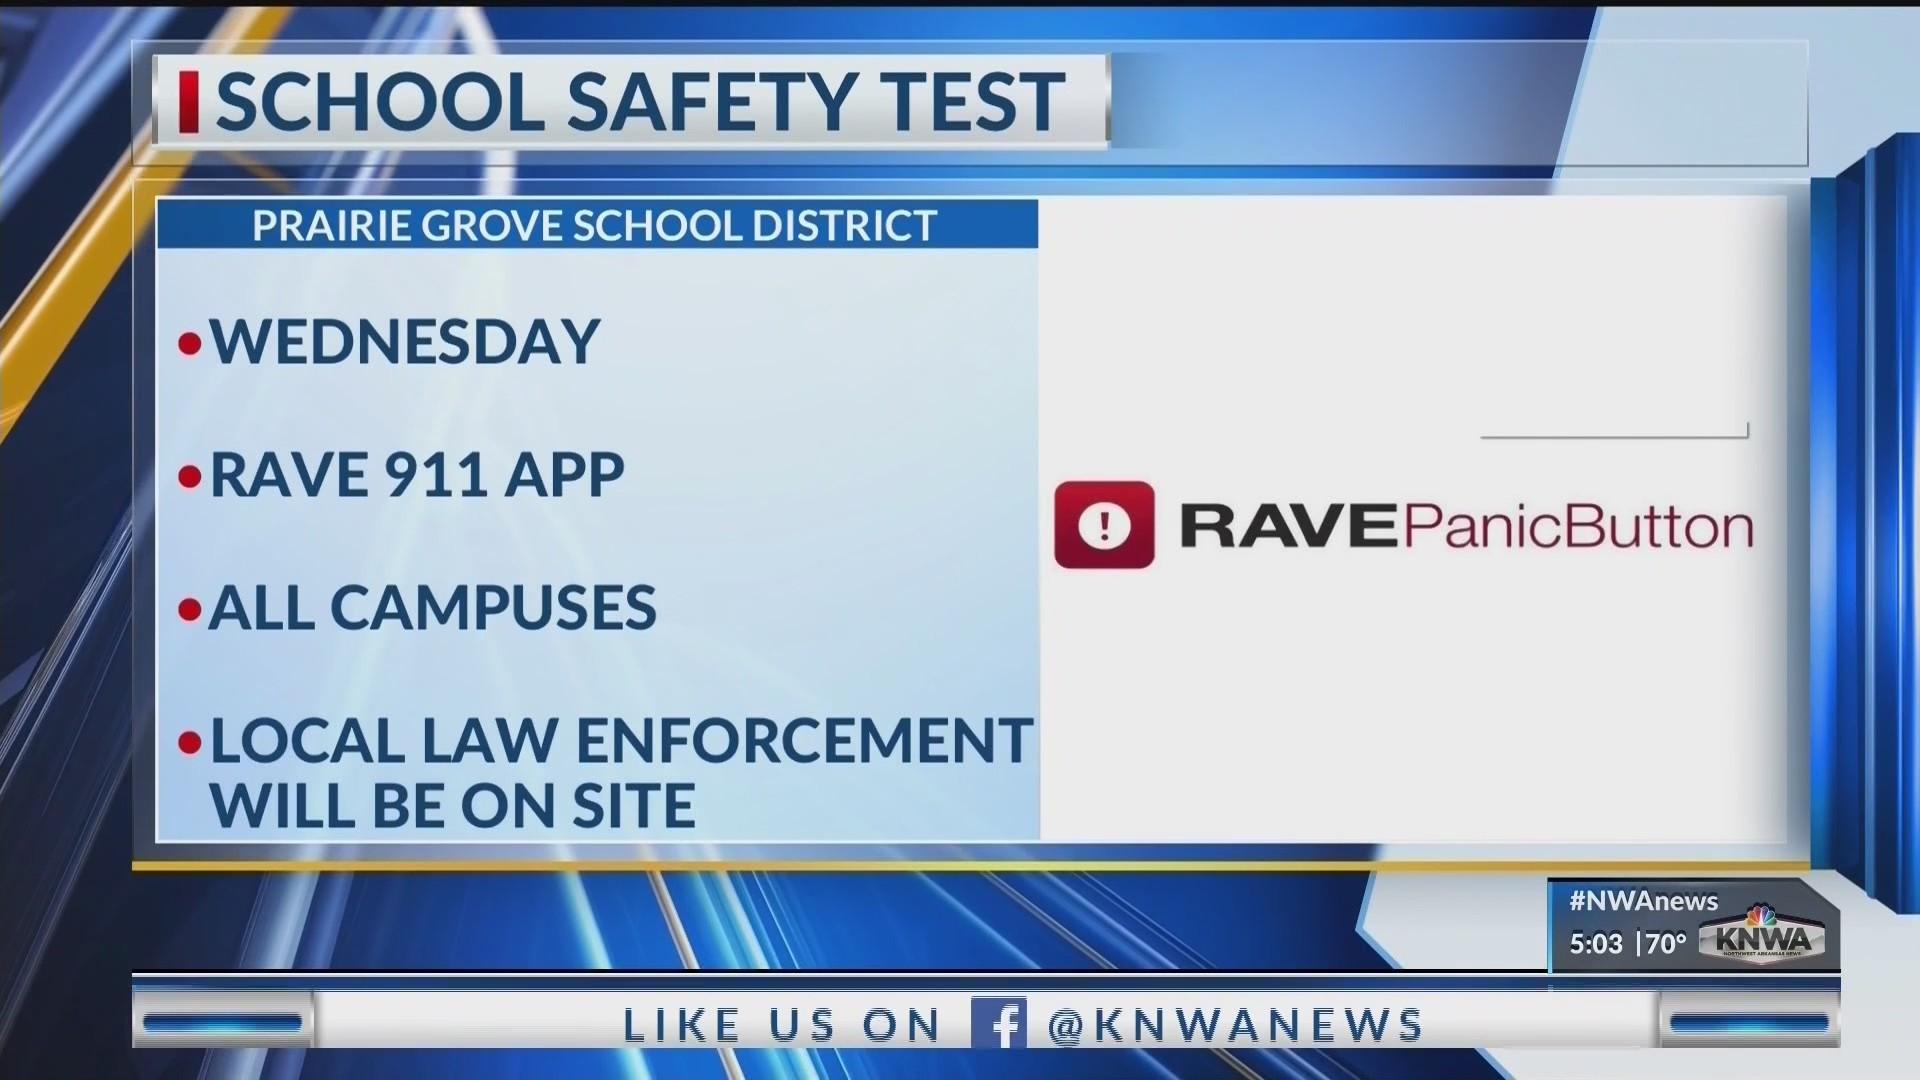 Prairie_Grove_School_District_Tests_Safe_0_20181003111205